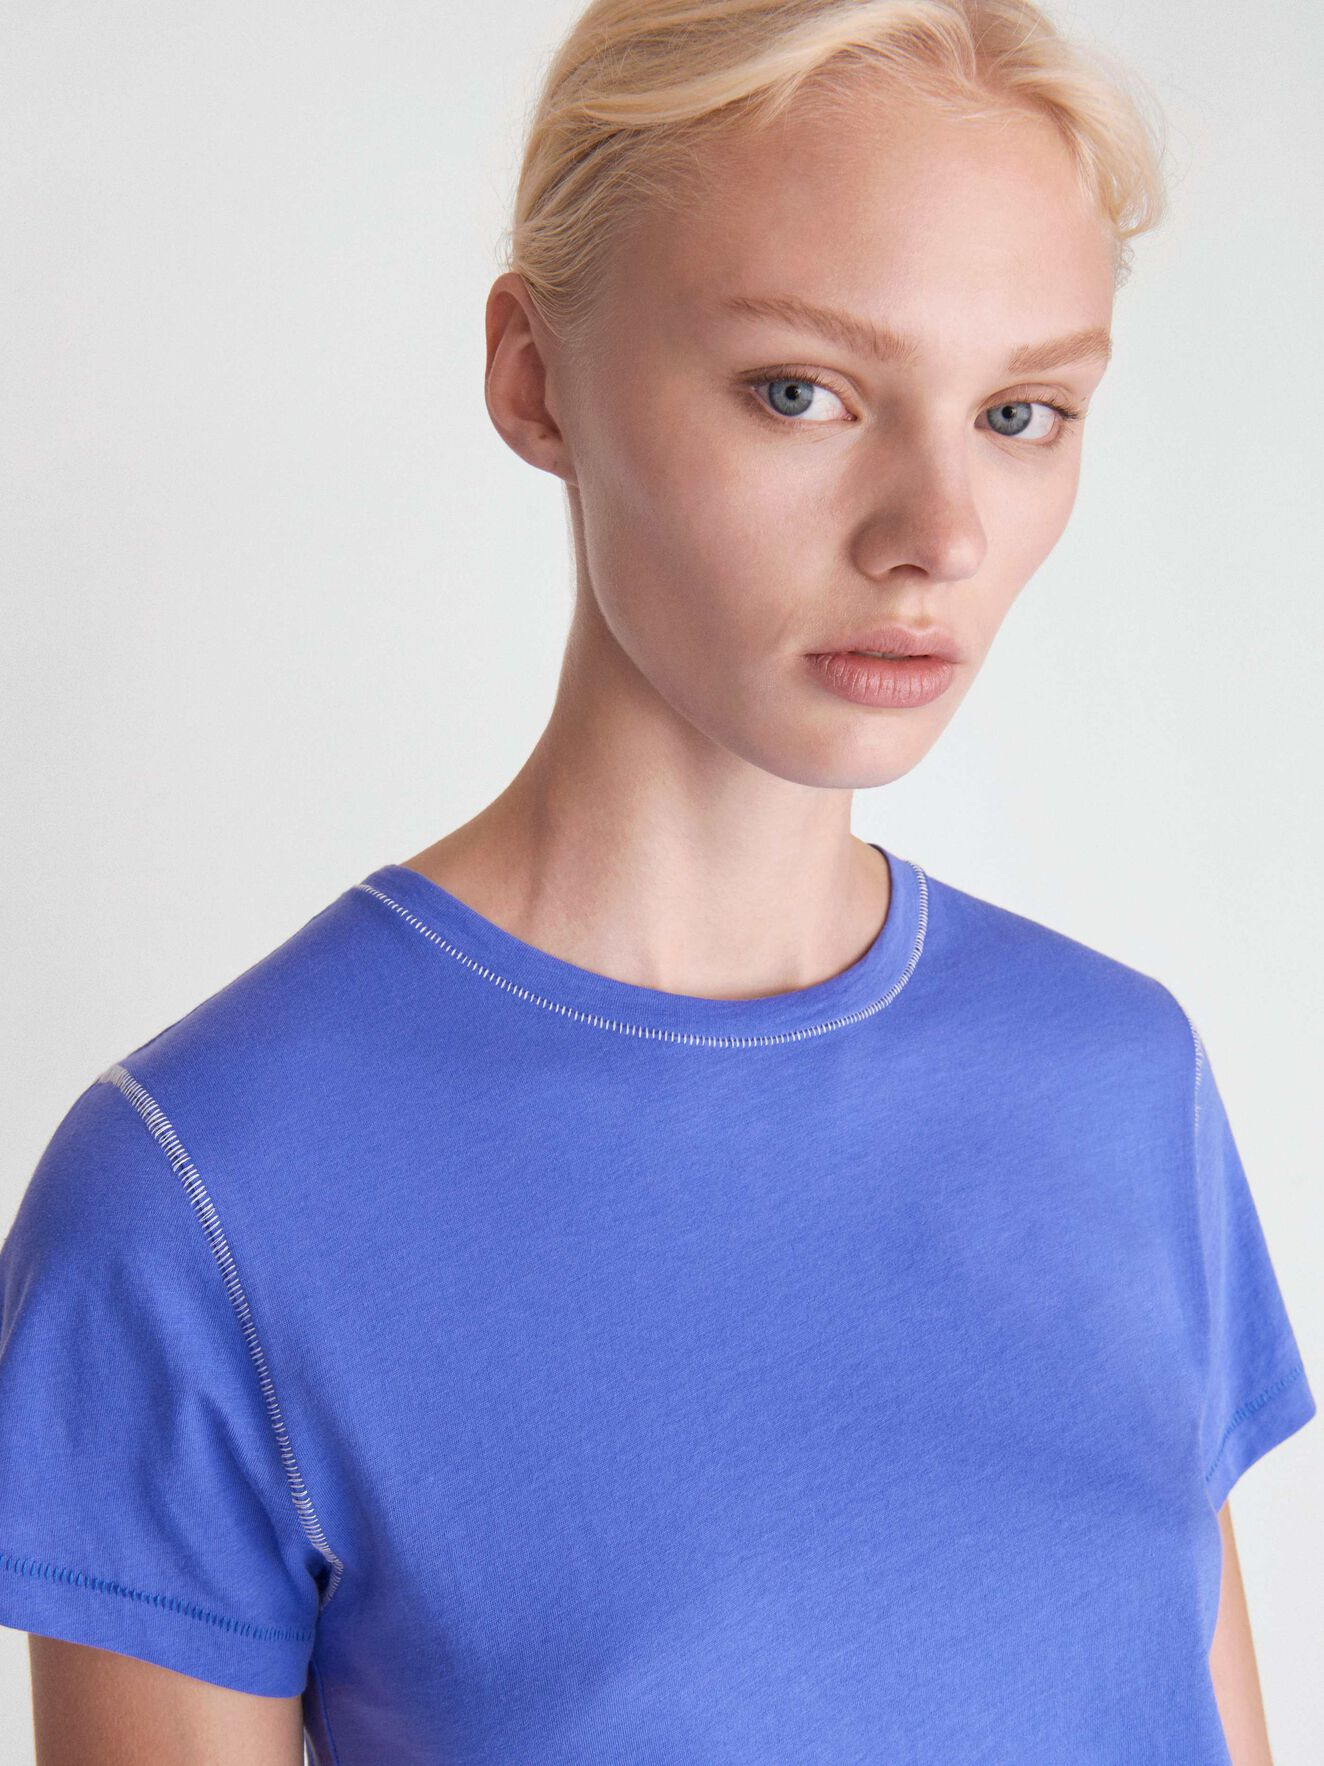 Nice T-Shirt in Violet Storm from Tiger of Sweden